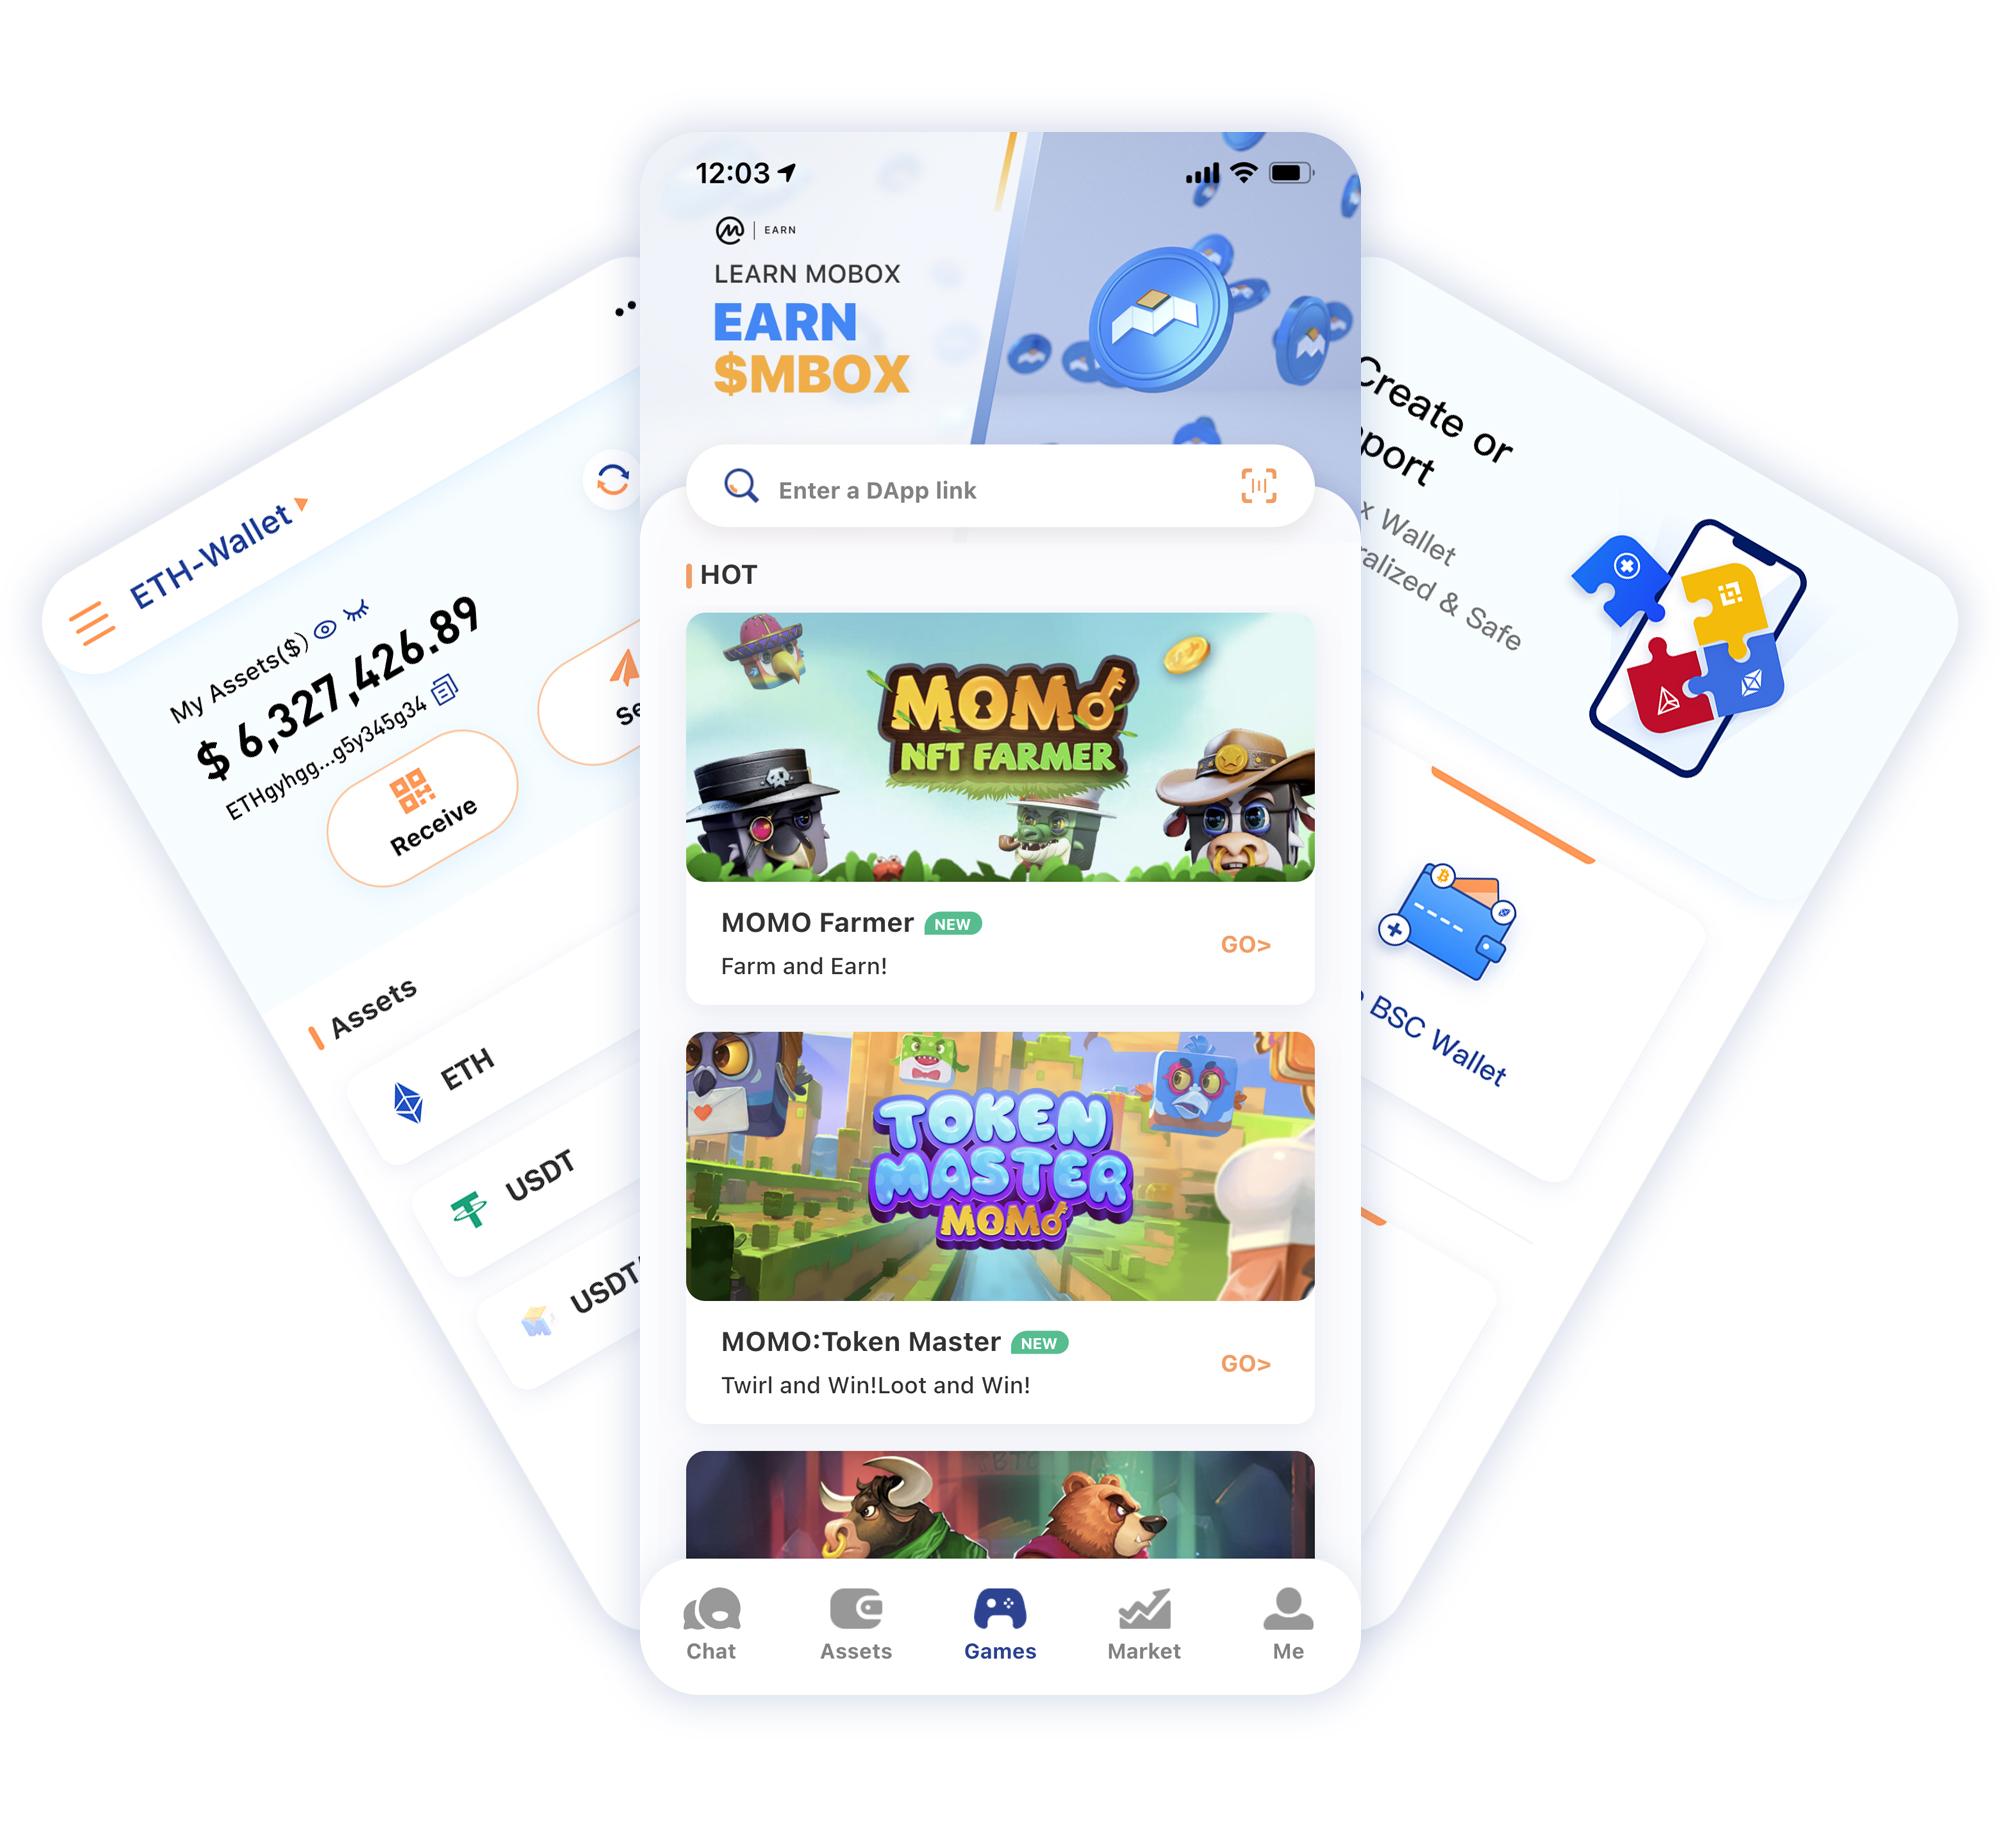 mobox token